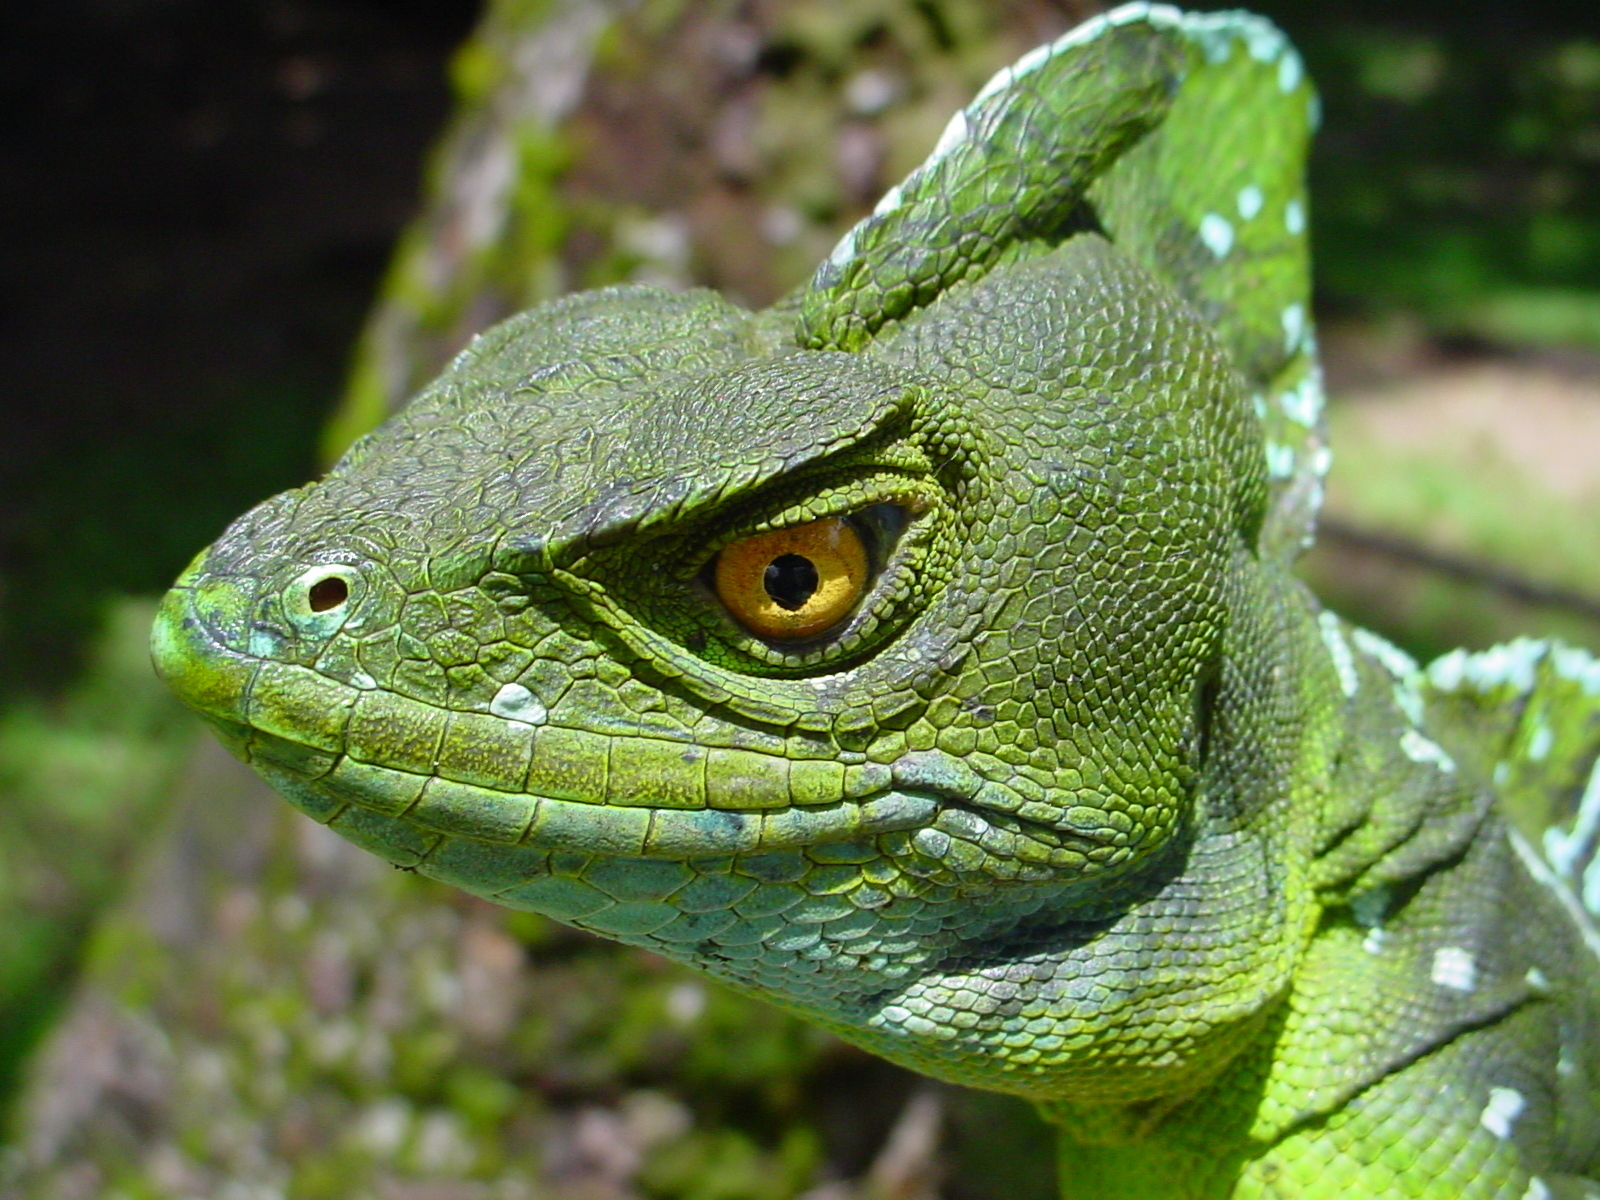 reptiles Photo